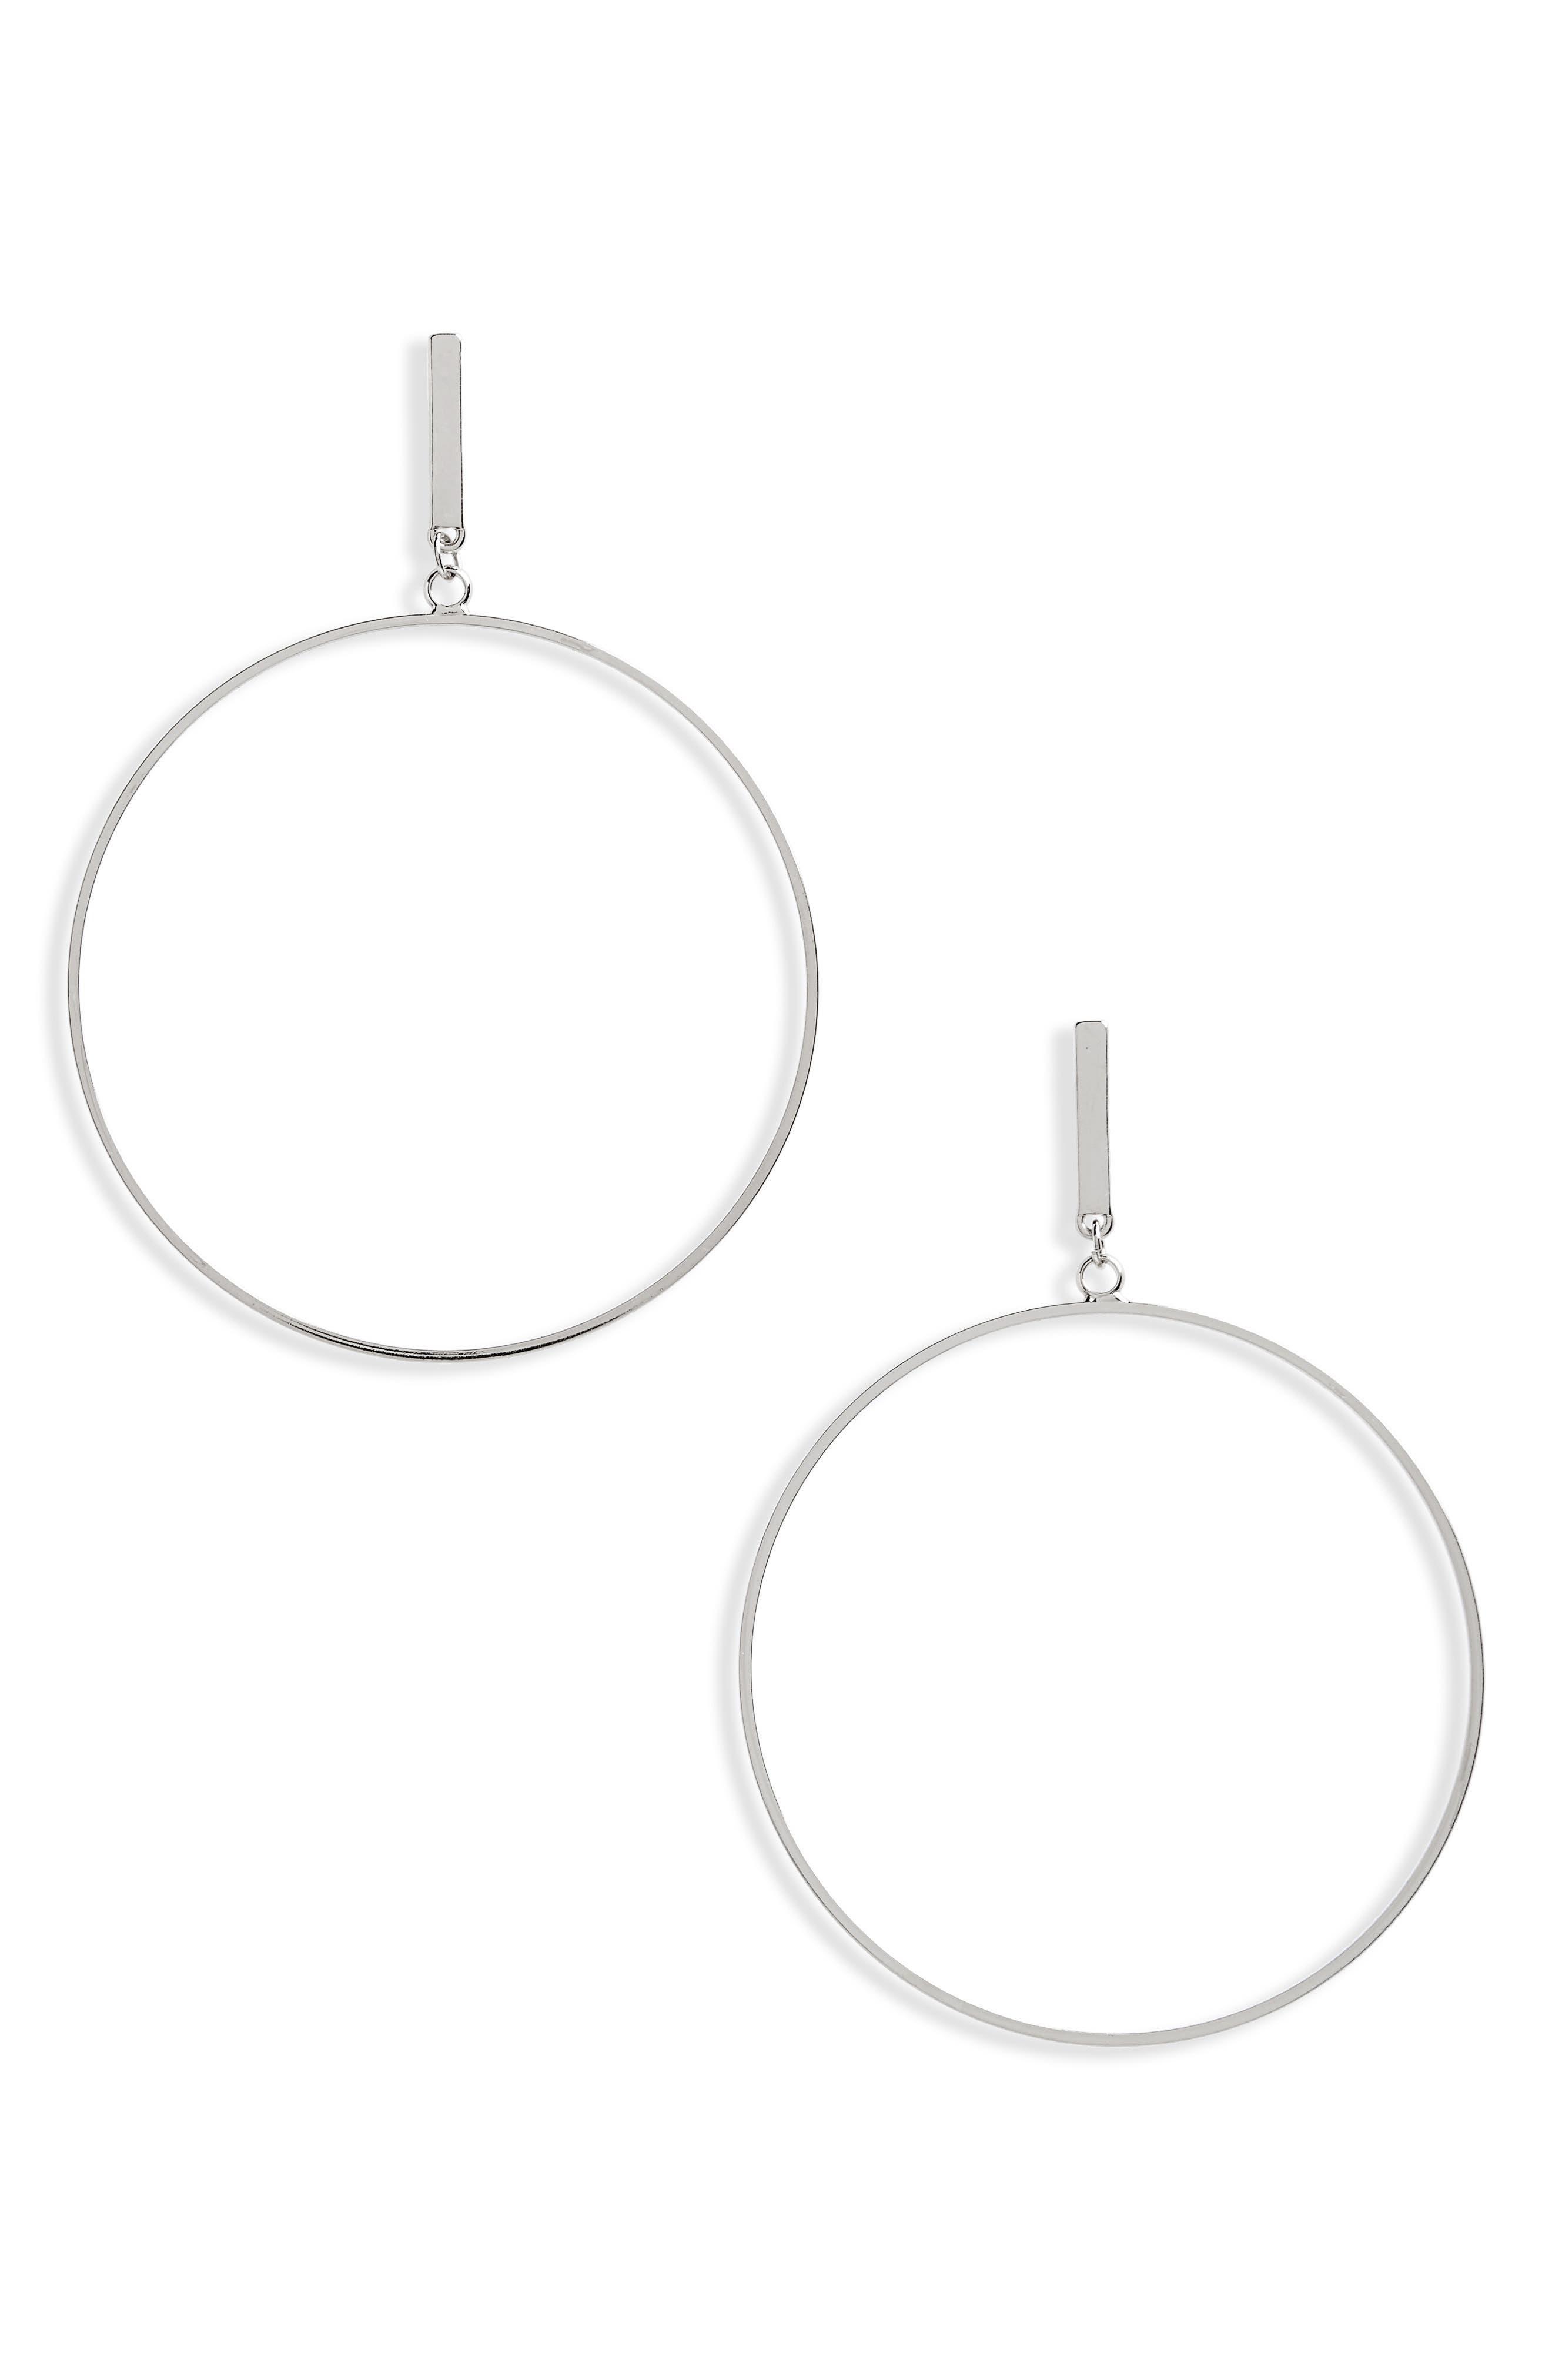 Large Post Hoop Earrings,                             Main thumbnail 1, color,                             Silver